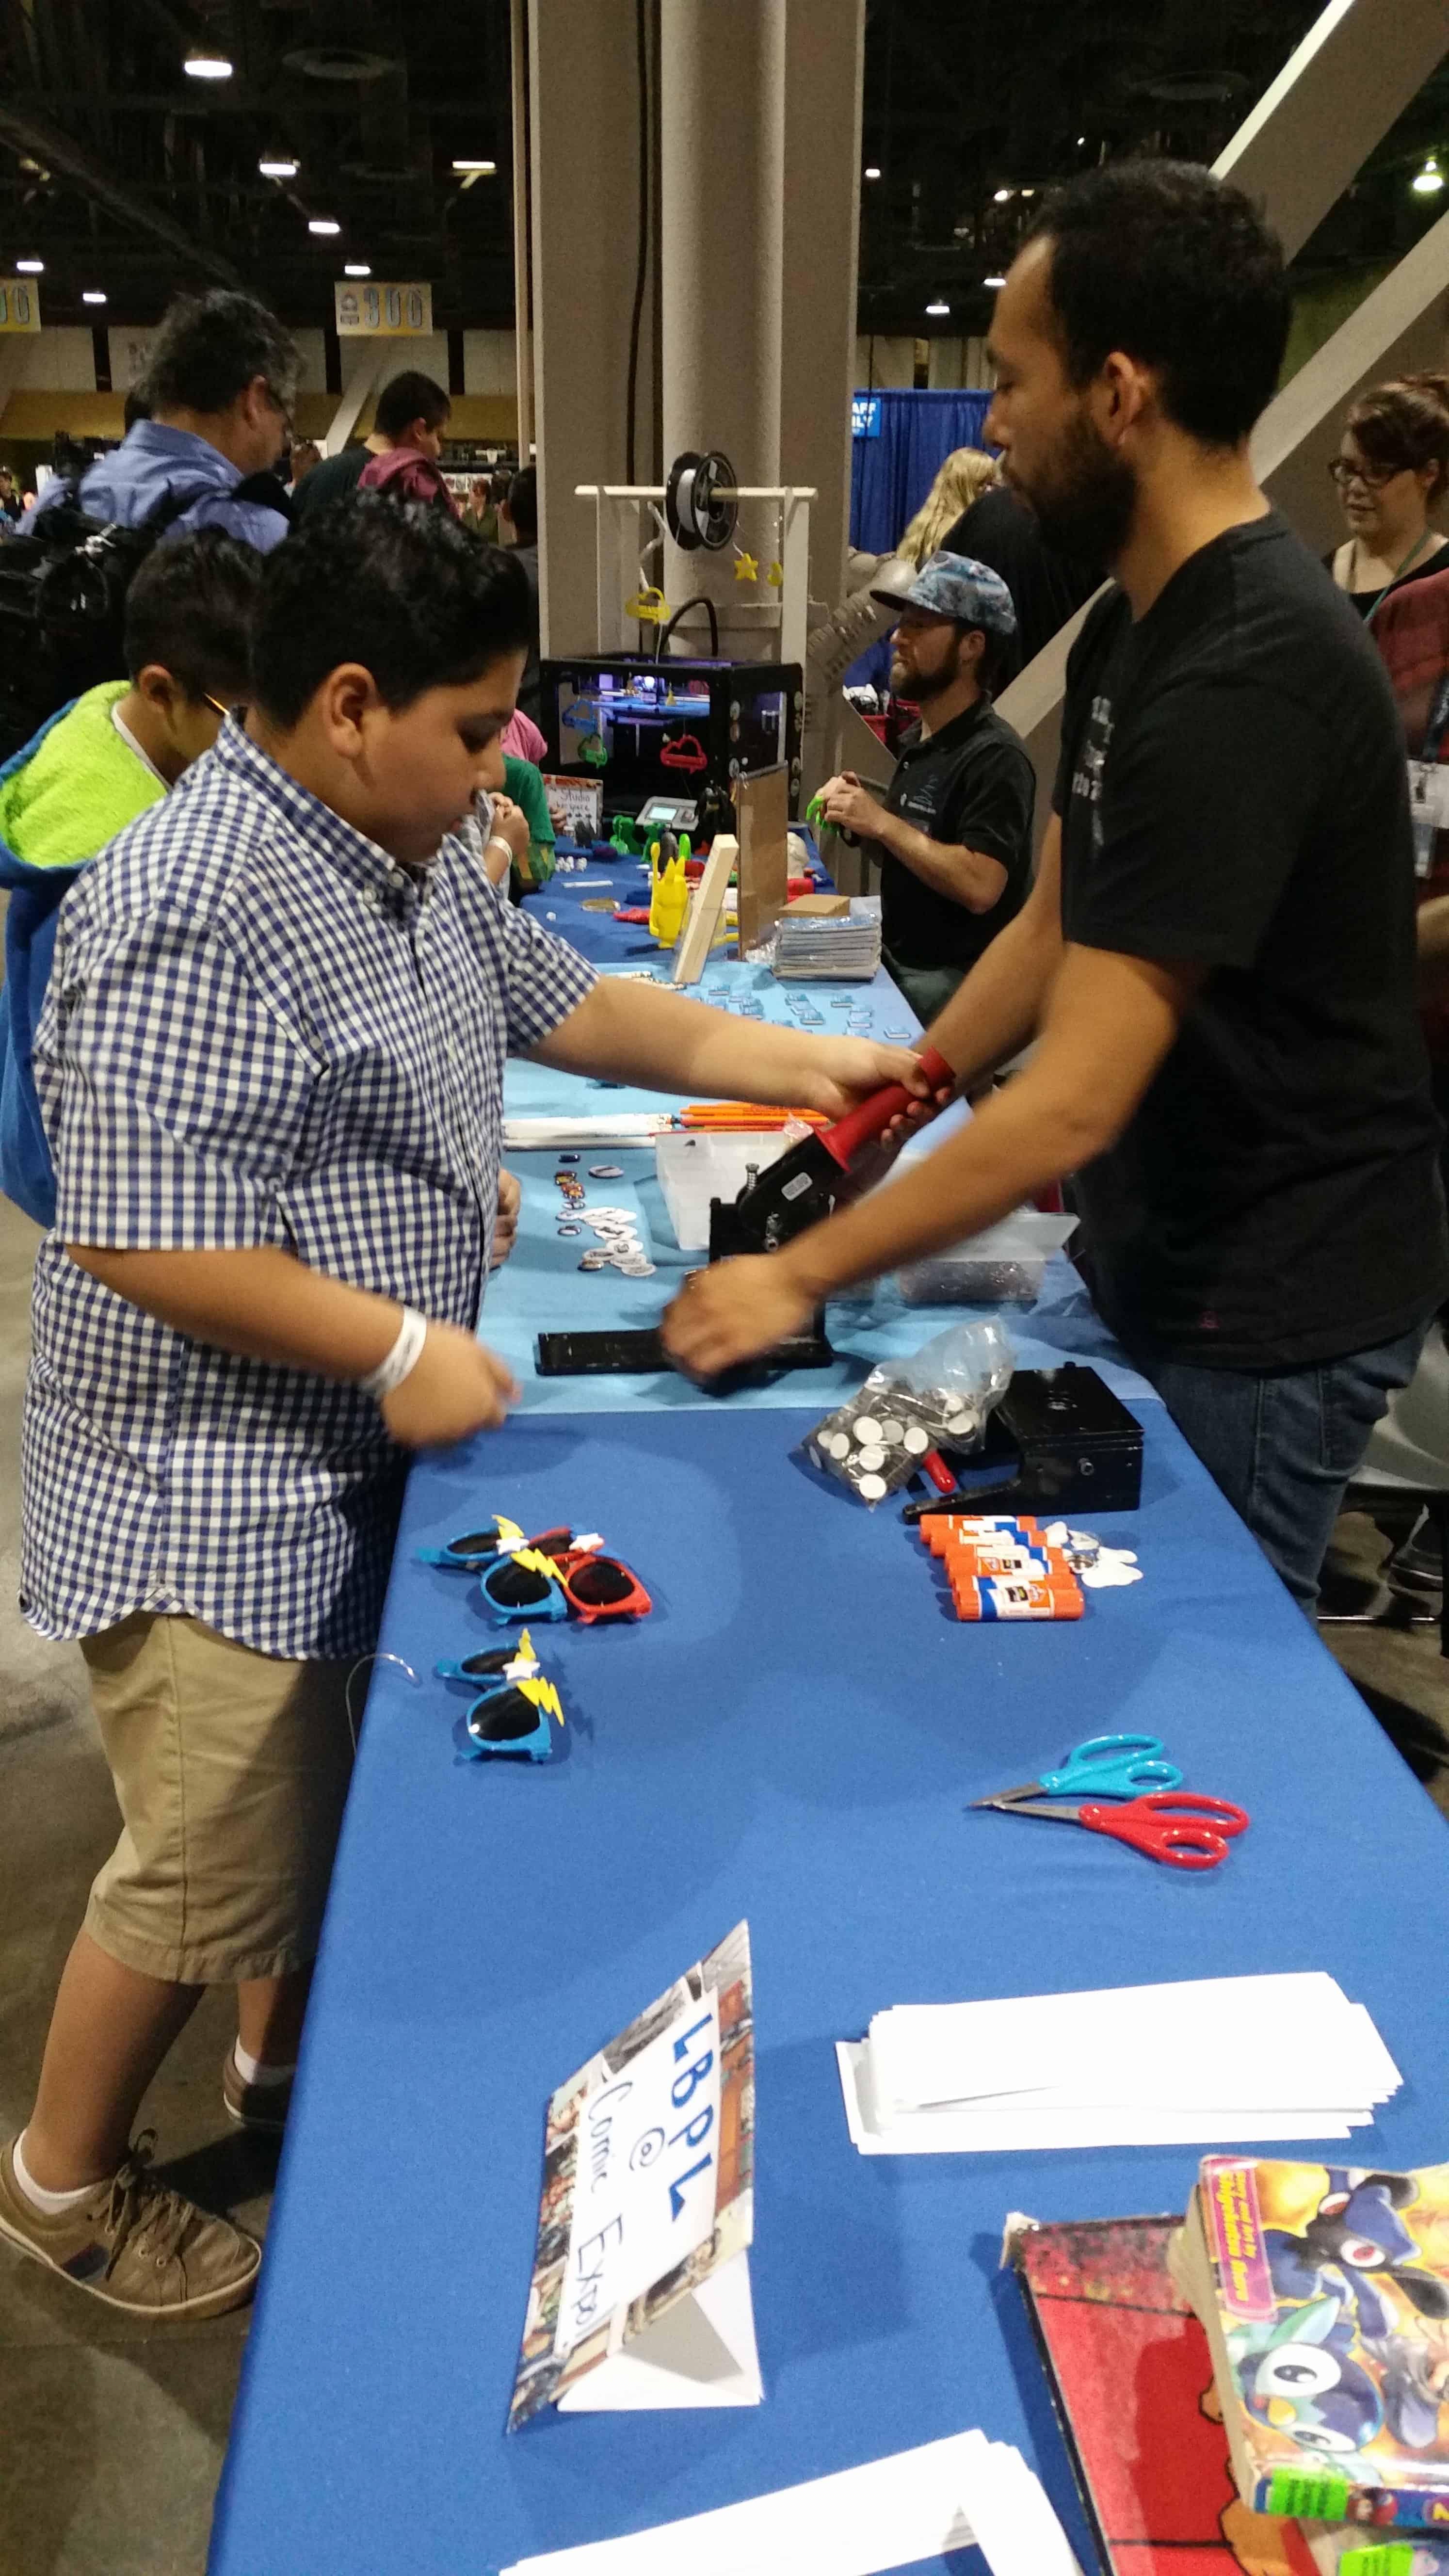 2016 Long Beach Comic Expo Media Coverage #LBCC